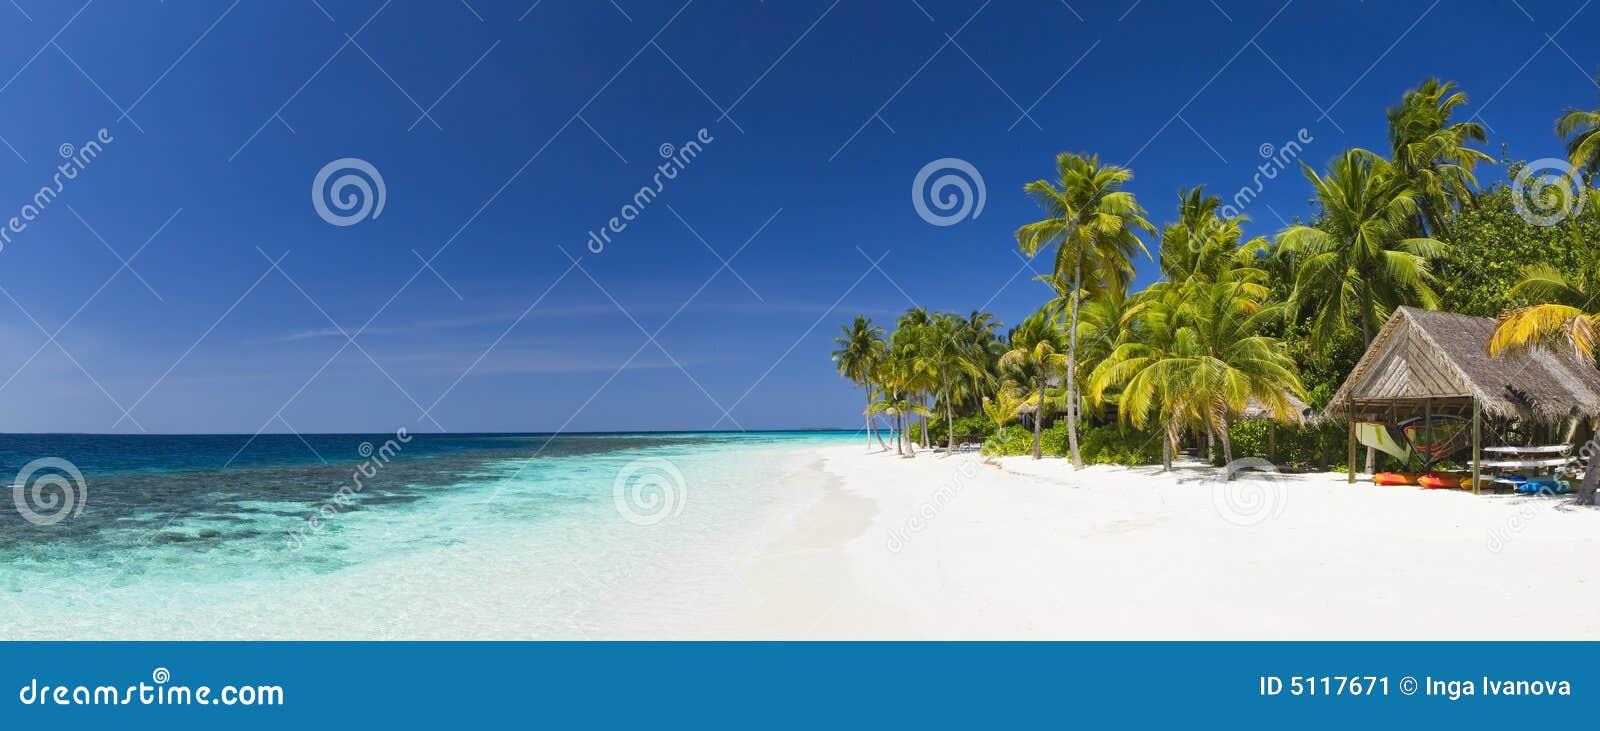 Panorama kurort tropikalne wyspy